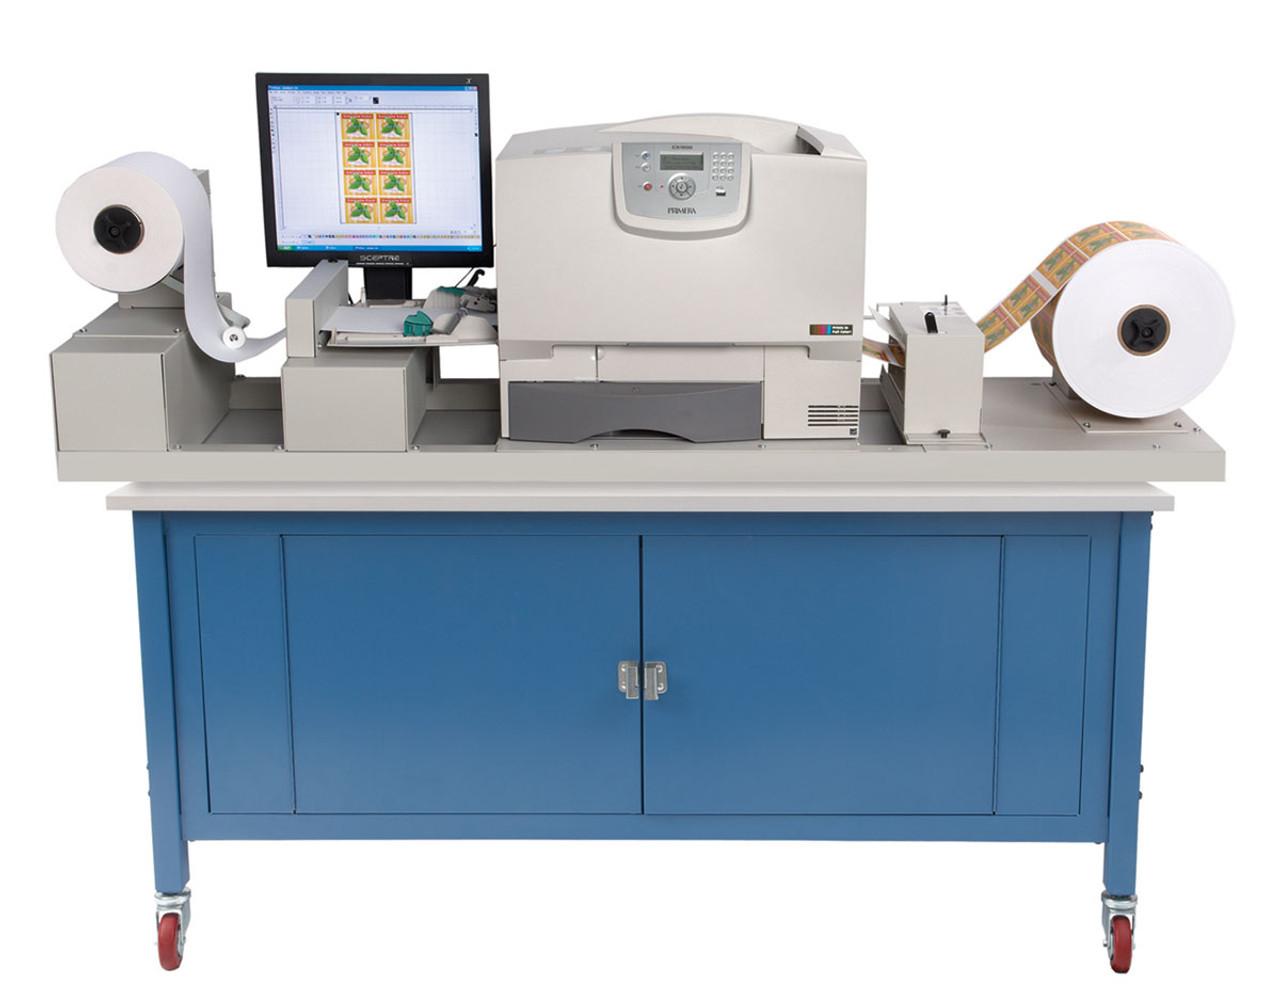 Primera CX1200 Color laser label printer